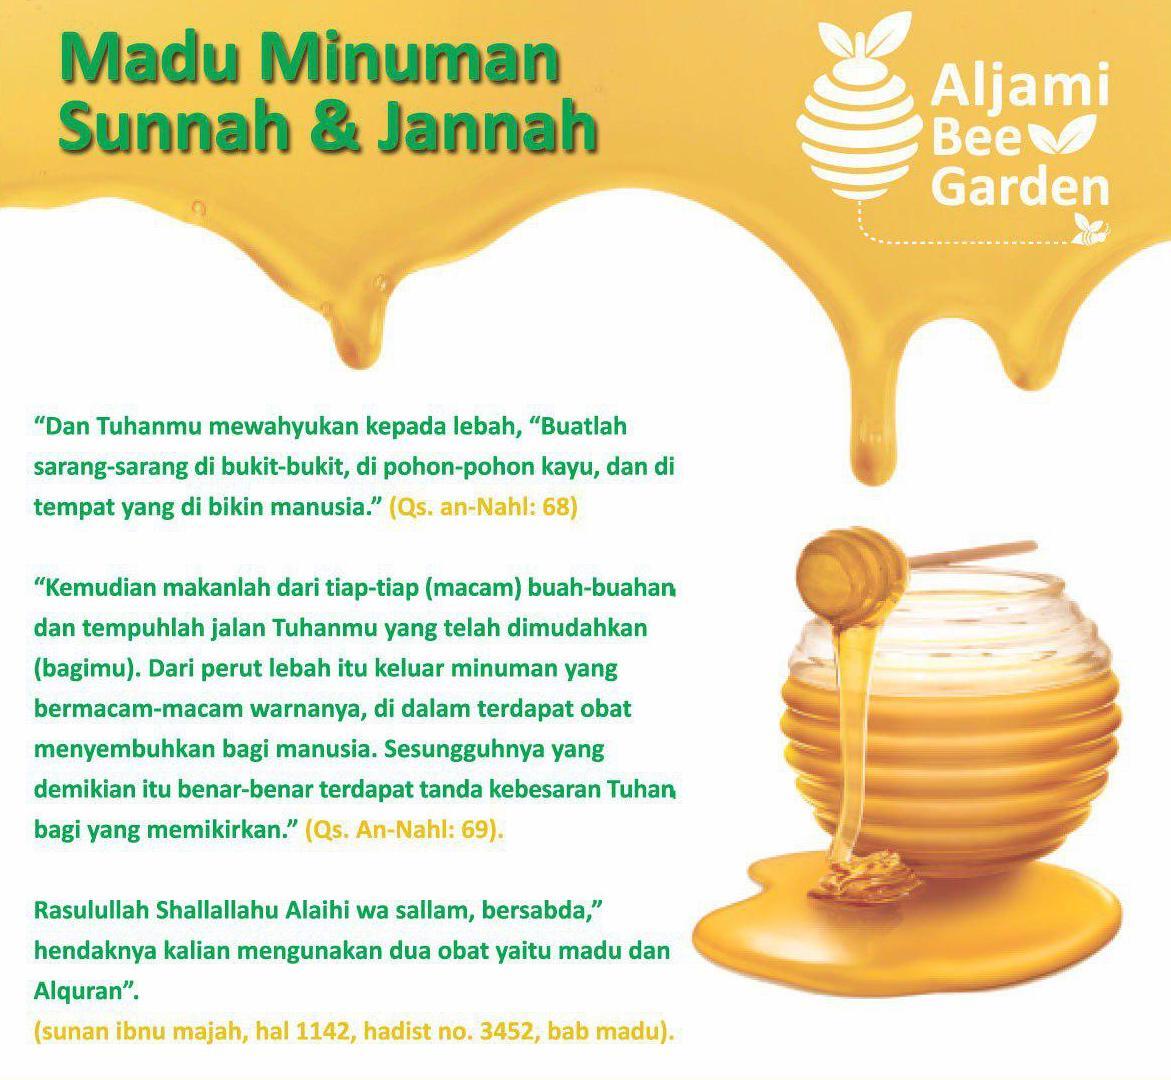 manfaat madu - kavling aljami bee garden